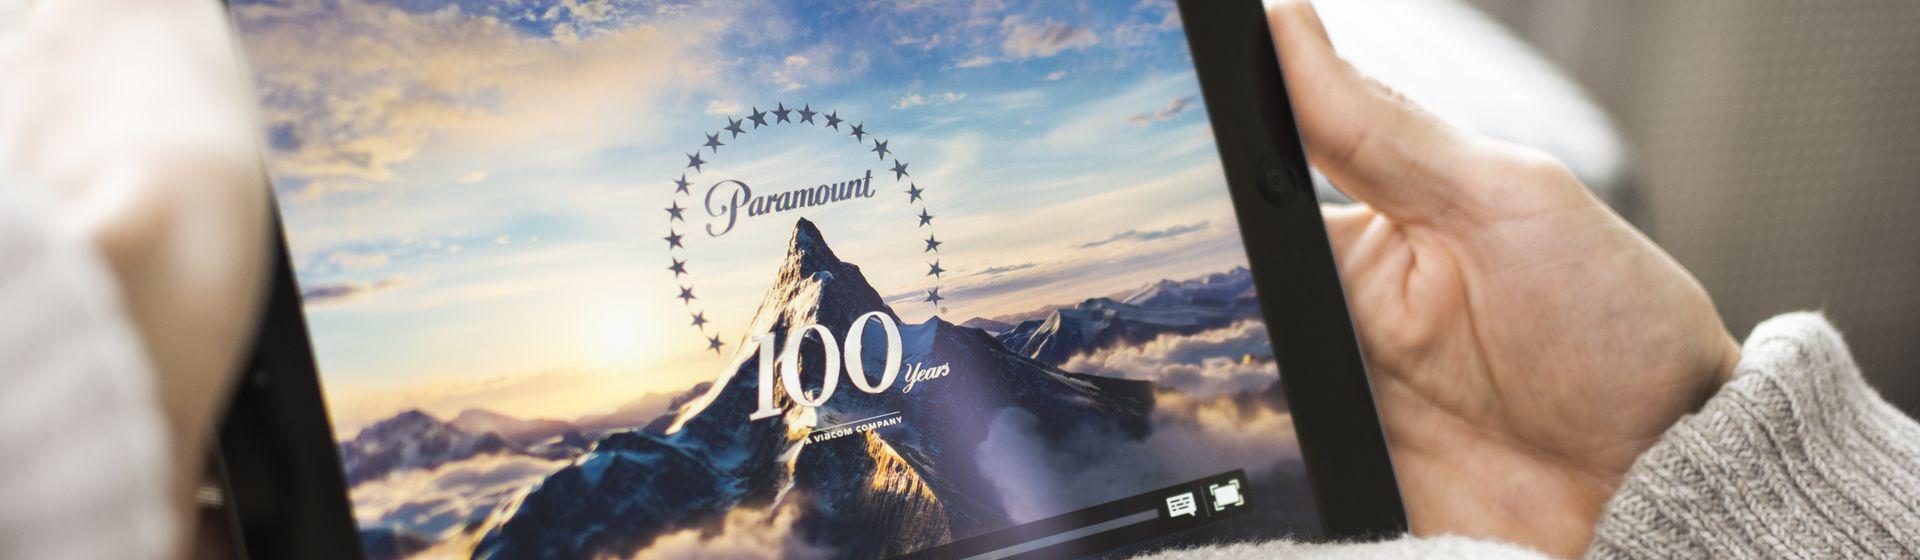 Paramount +: novo streaming de séries e filmes chega ao mercado